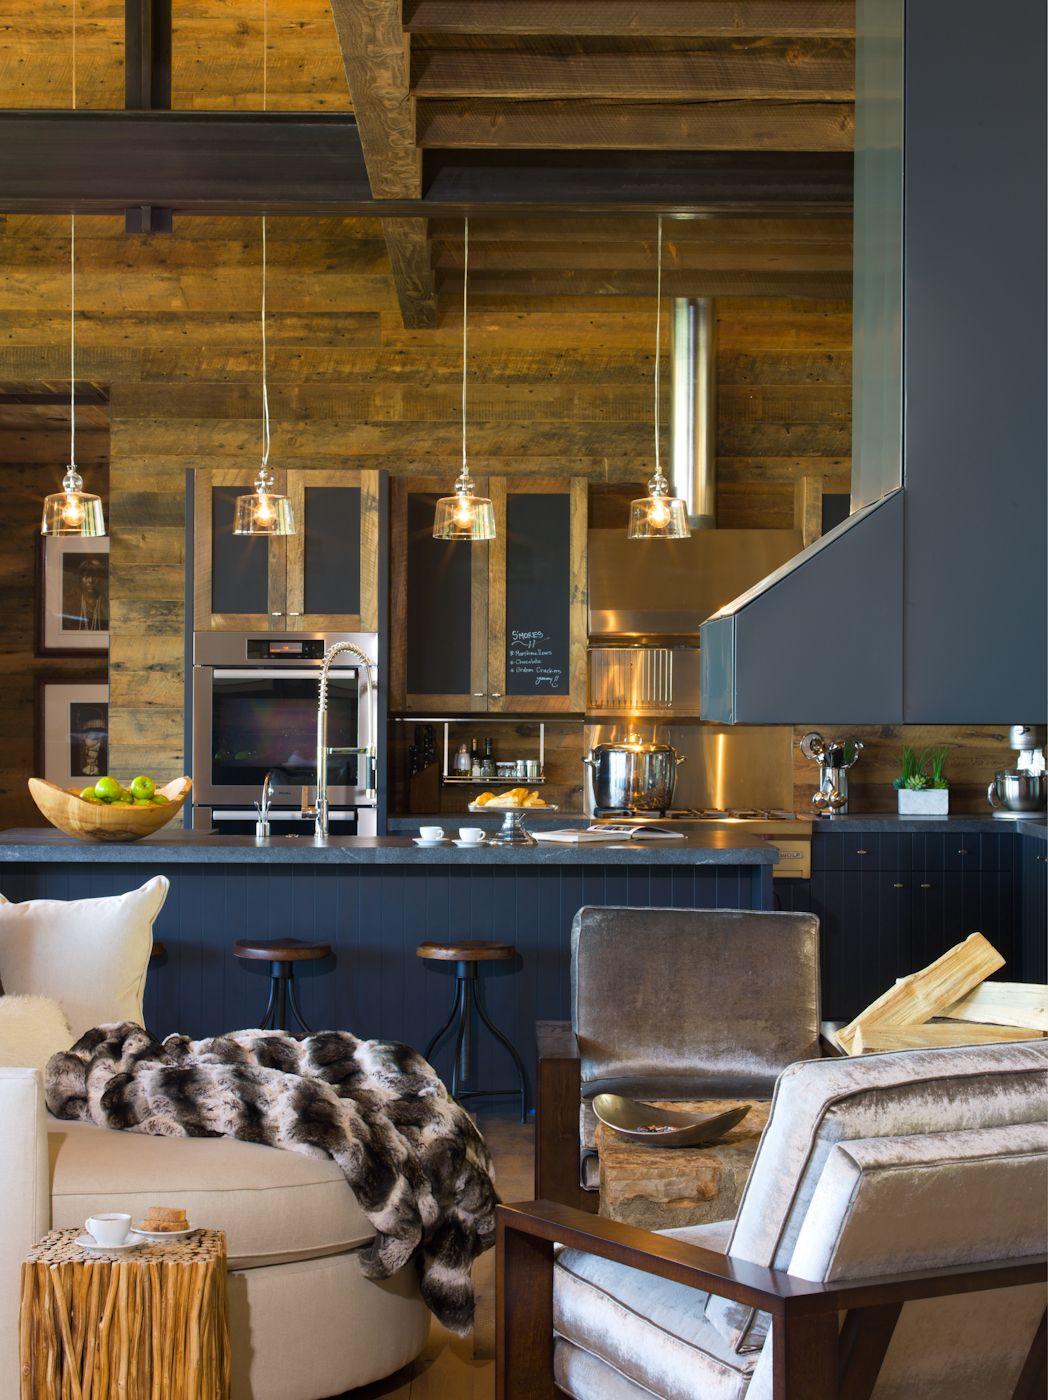 Snowmass Colorado  Kitchens  Pinterest  Kitchens Wooden Interesting Colorado Kitchen Design Design Inspiration